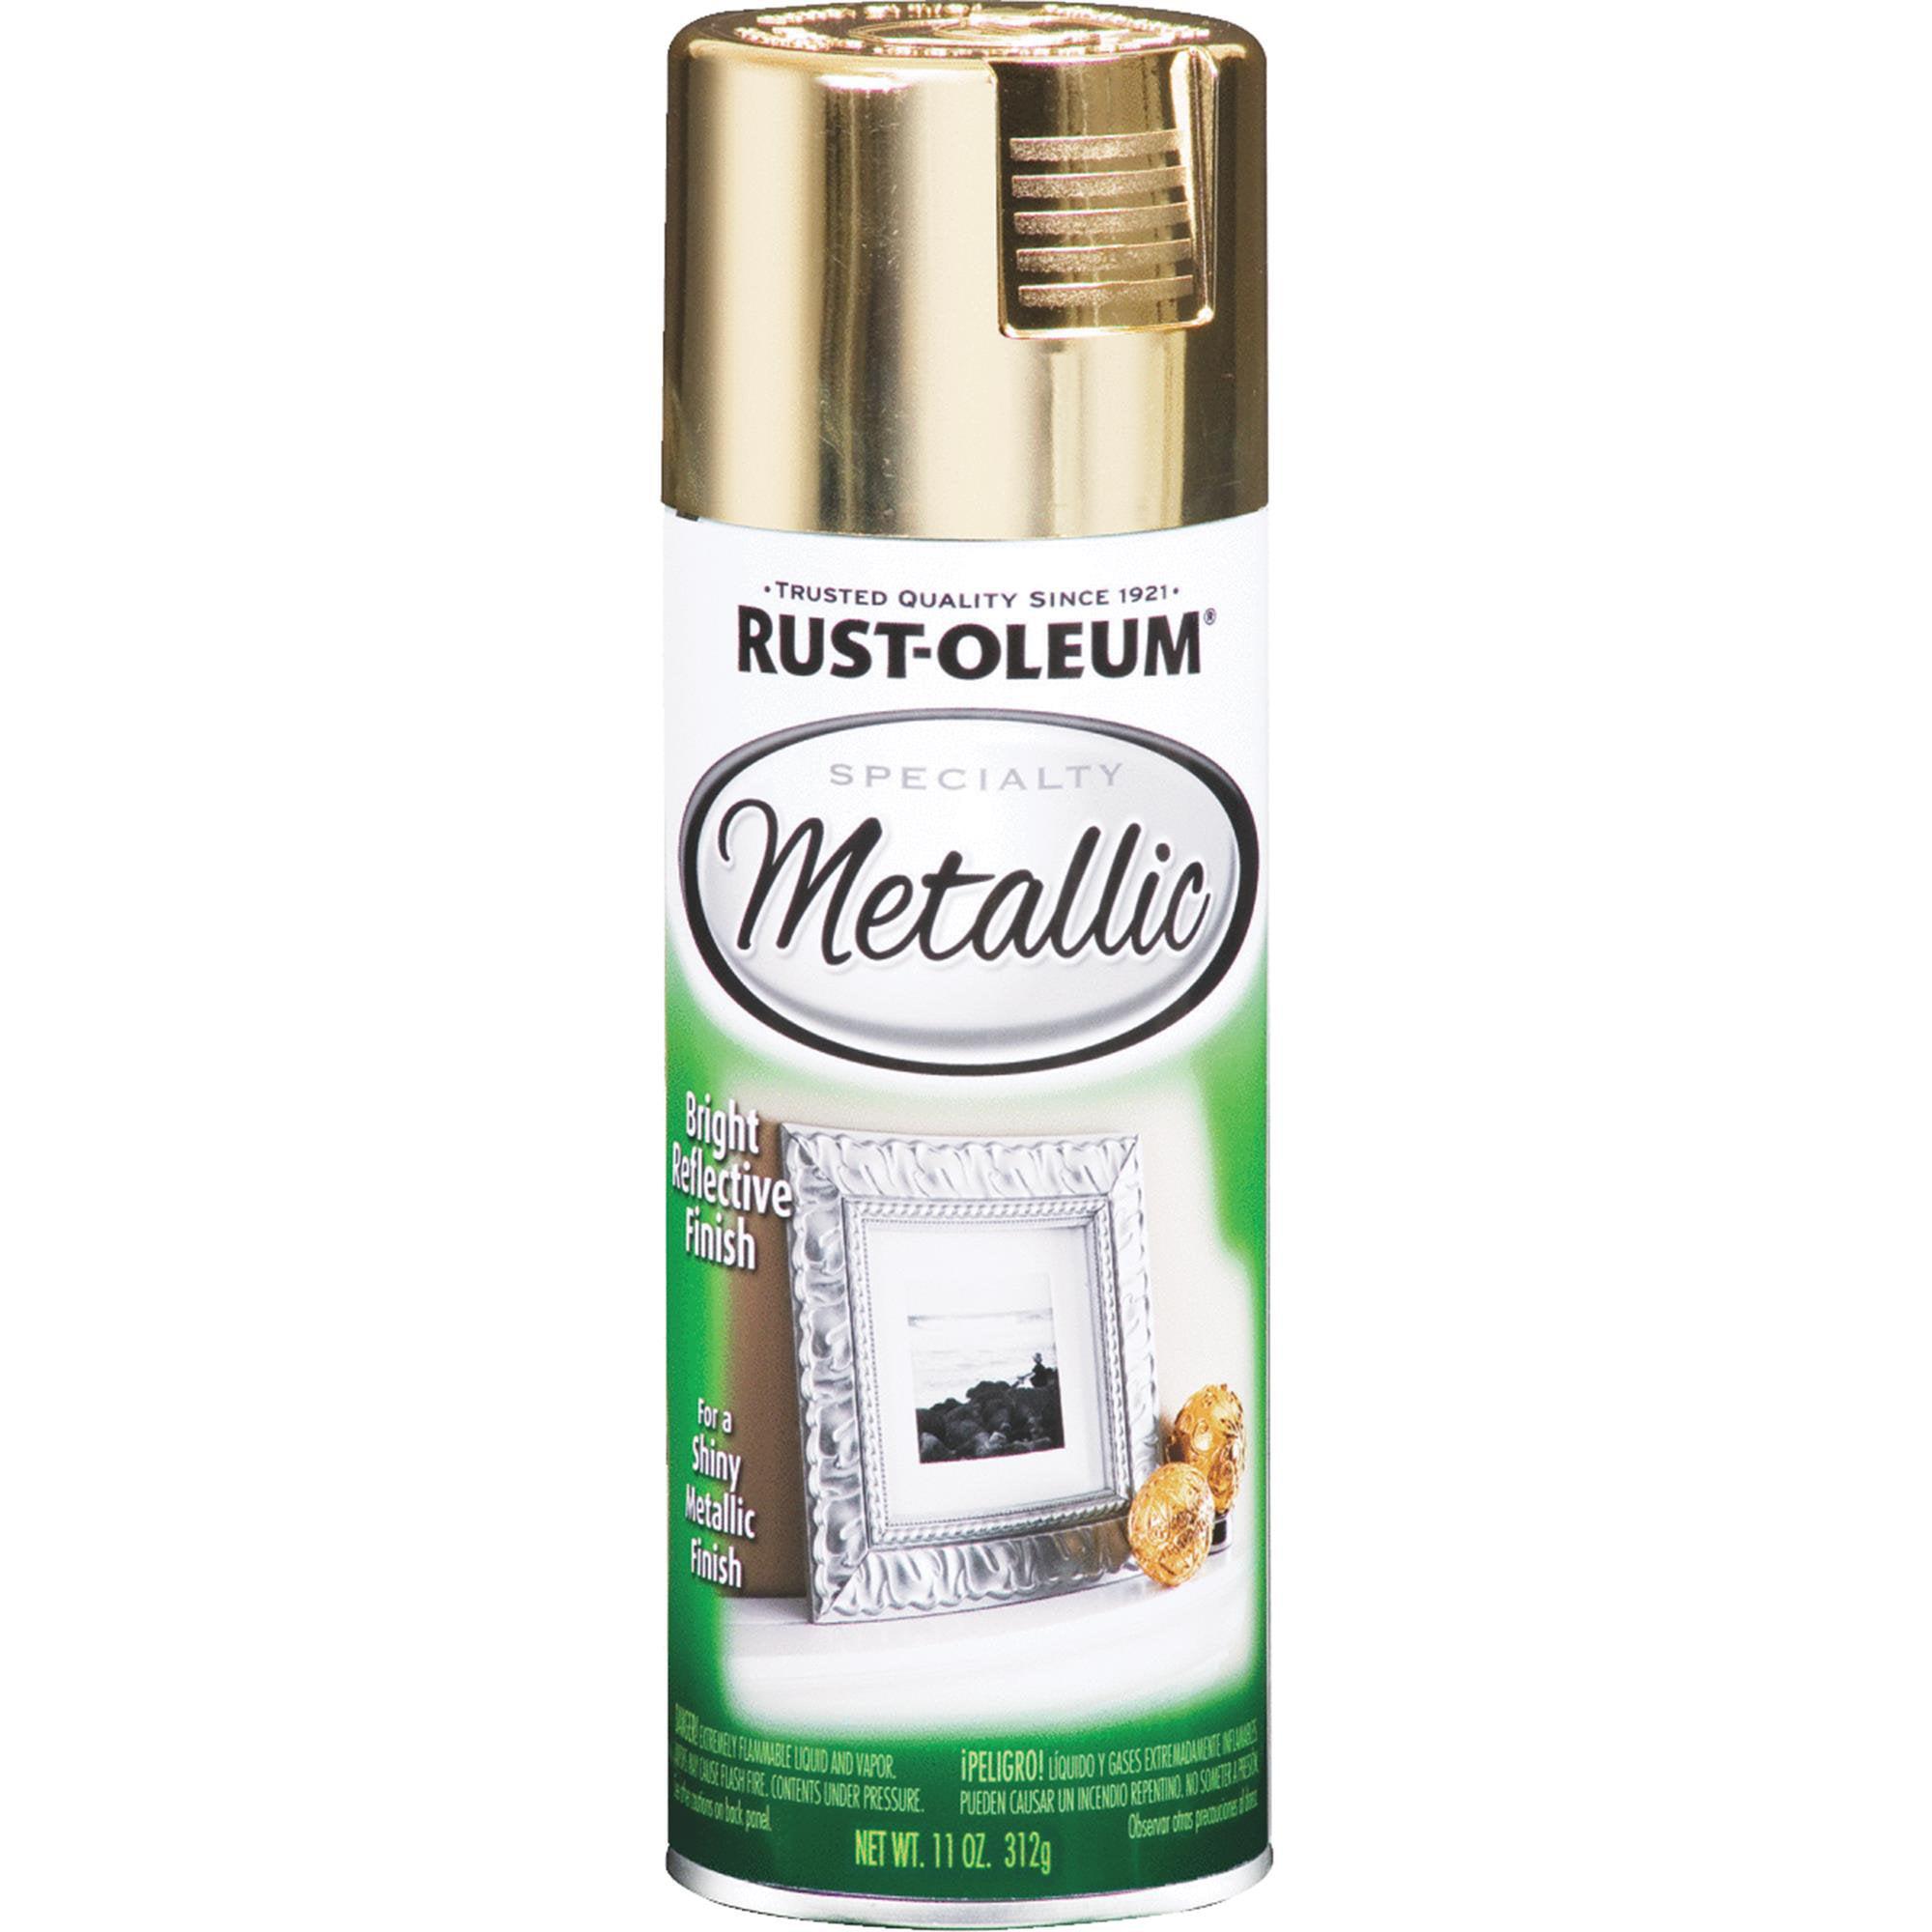 Rust-Oleum Specialty Metallic Spray, Gold